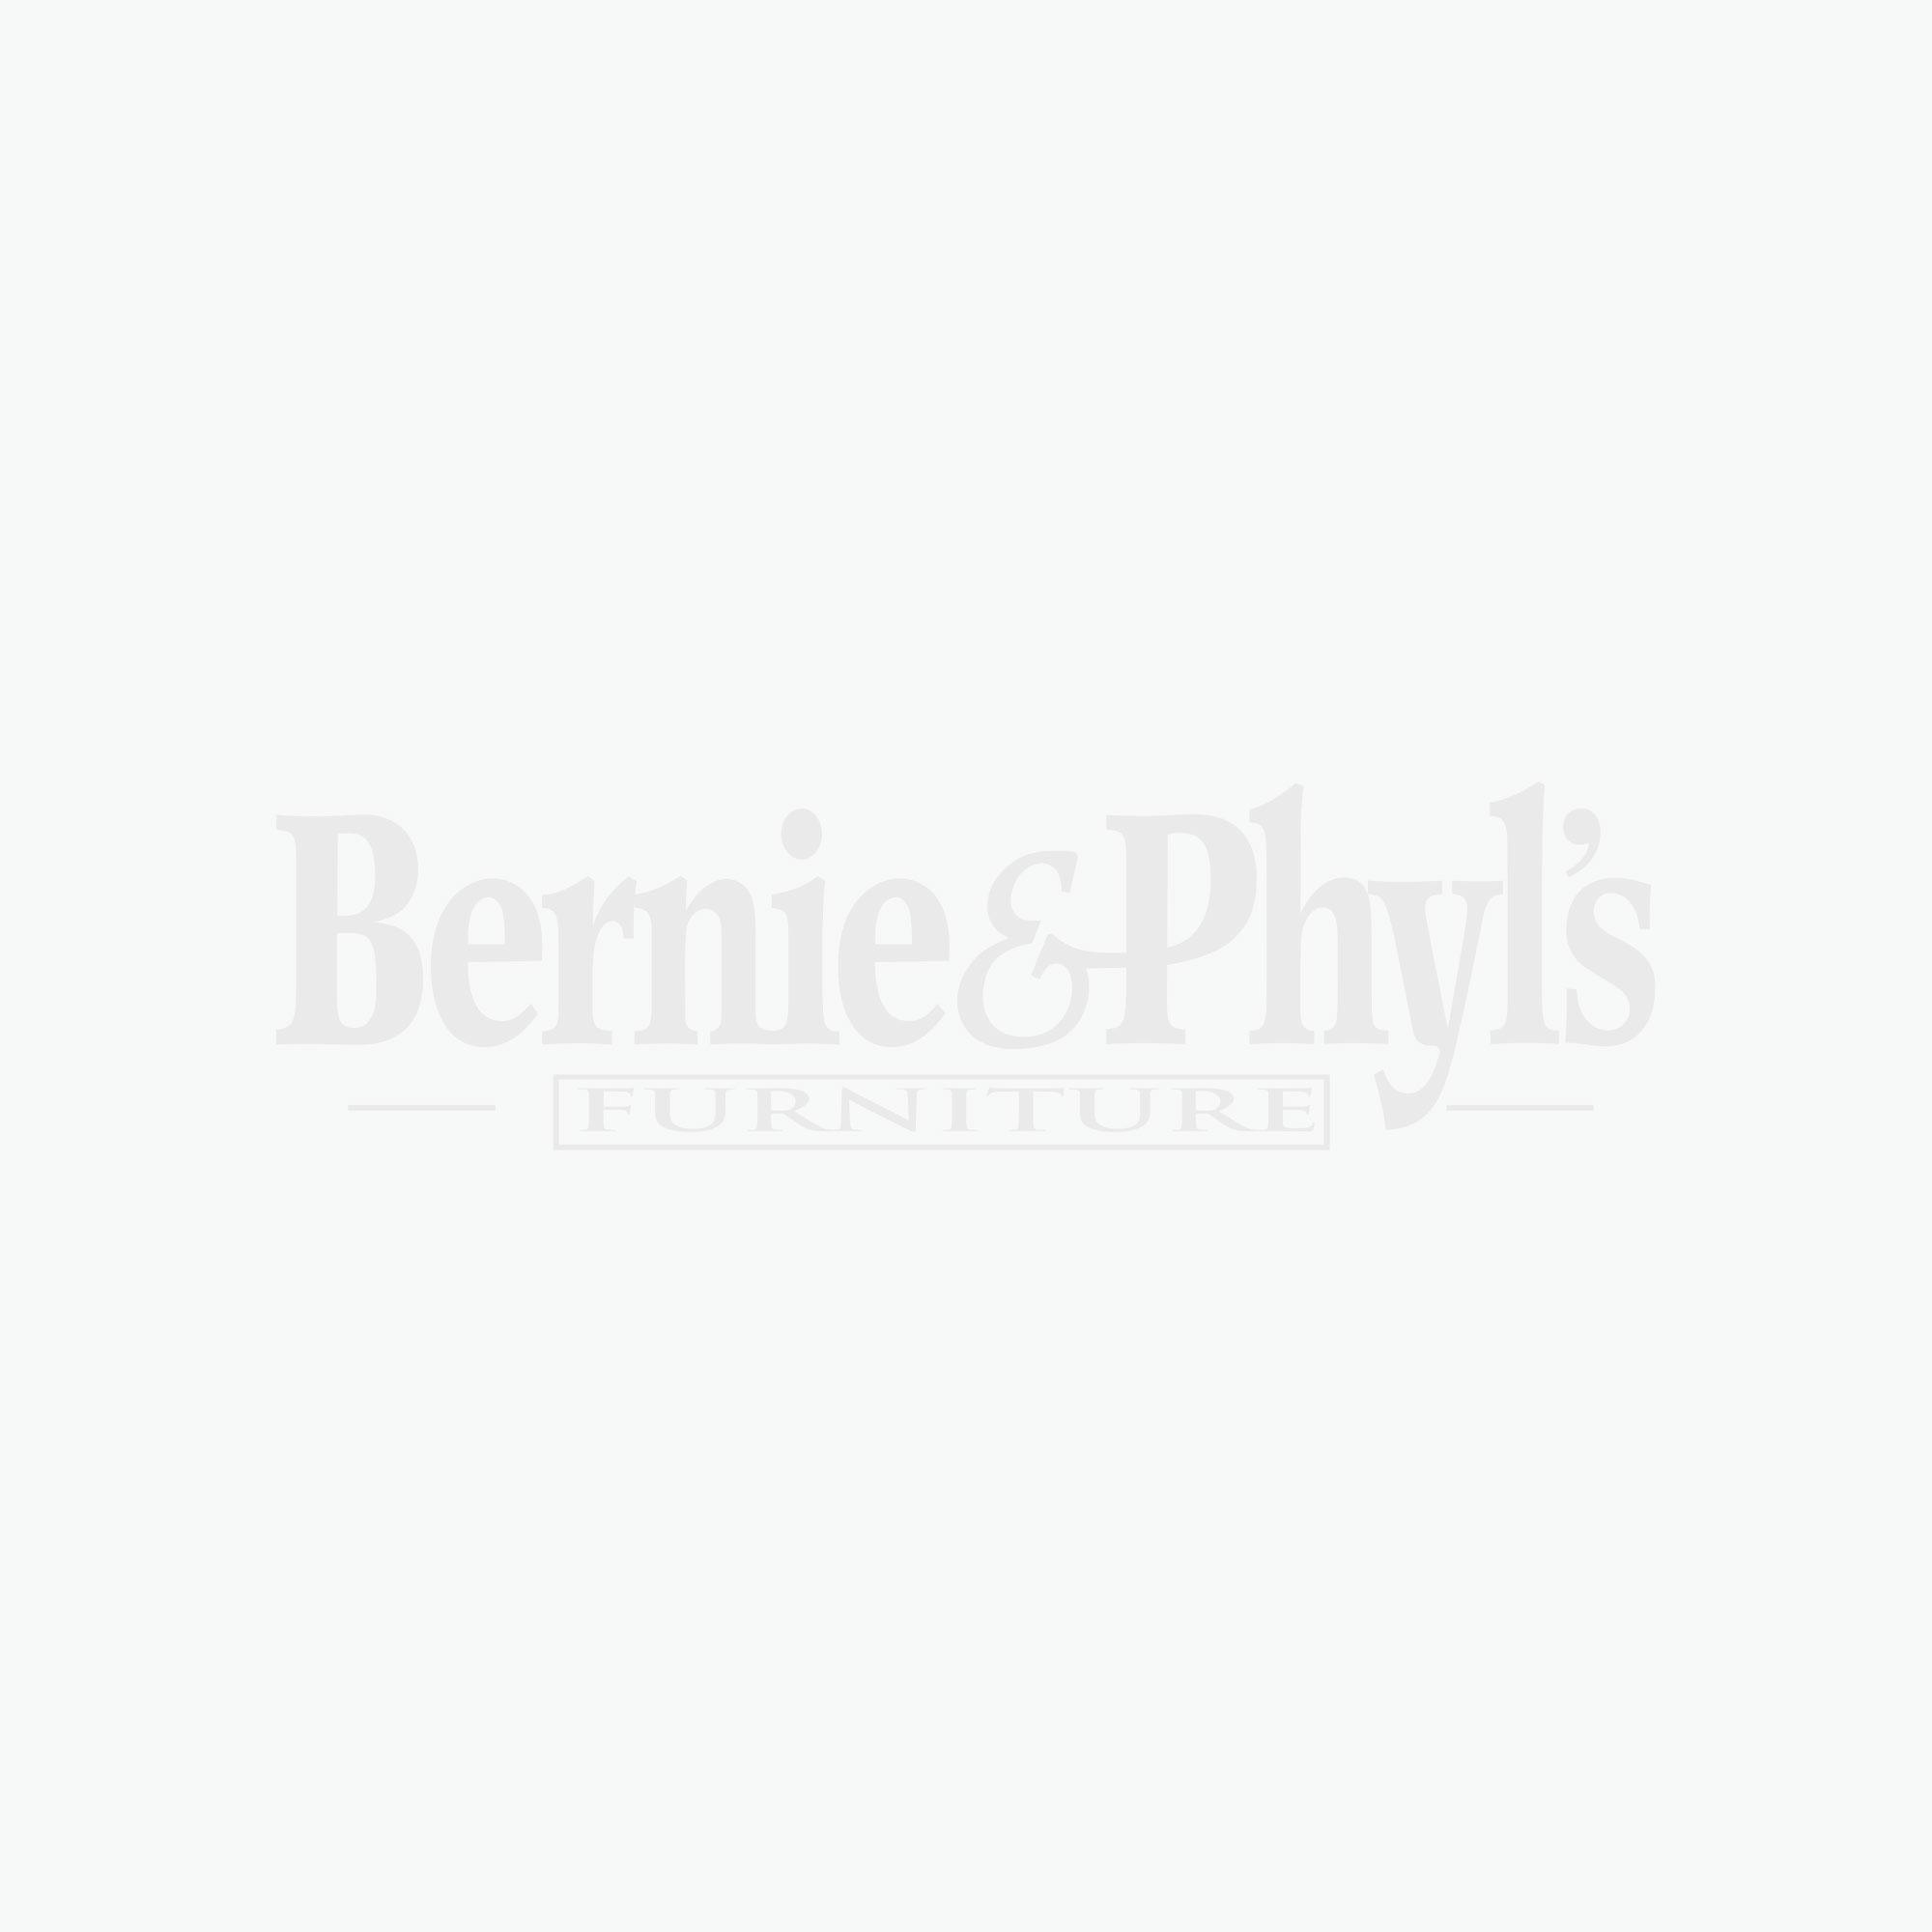 boston brownstone underbed storage bed - bernie & phyl's furniture